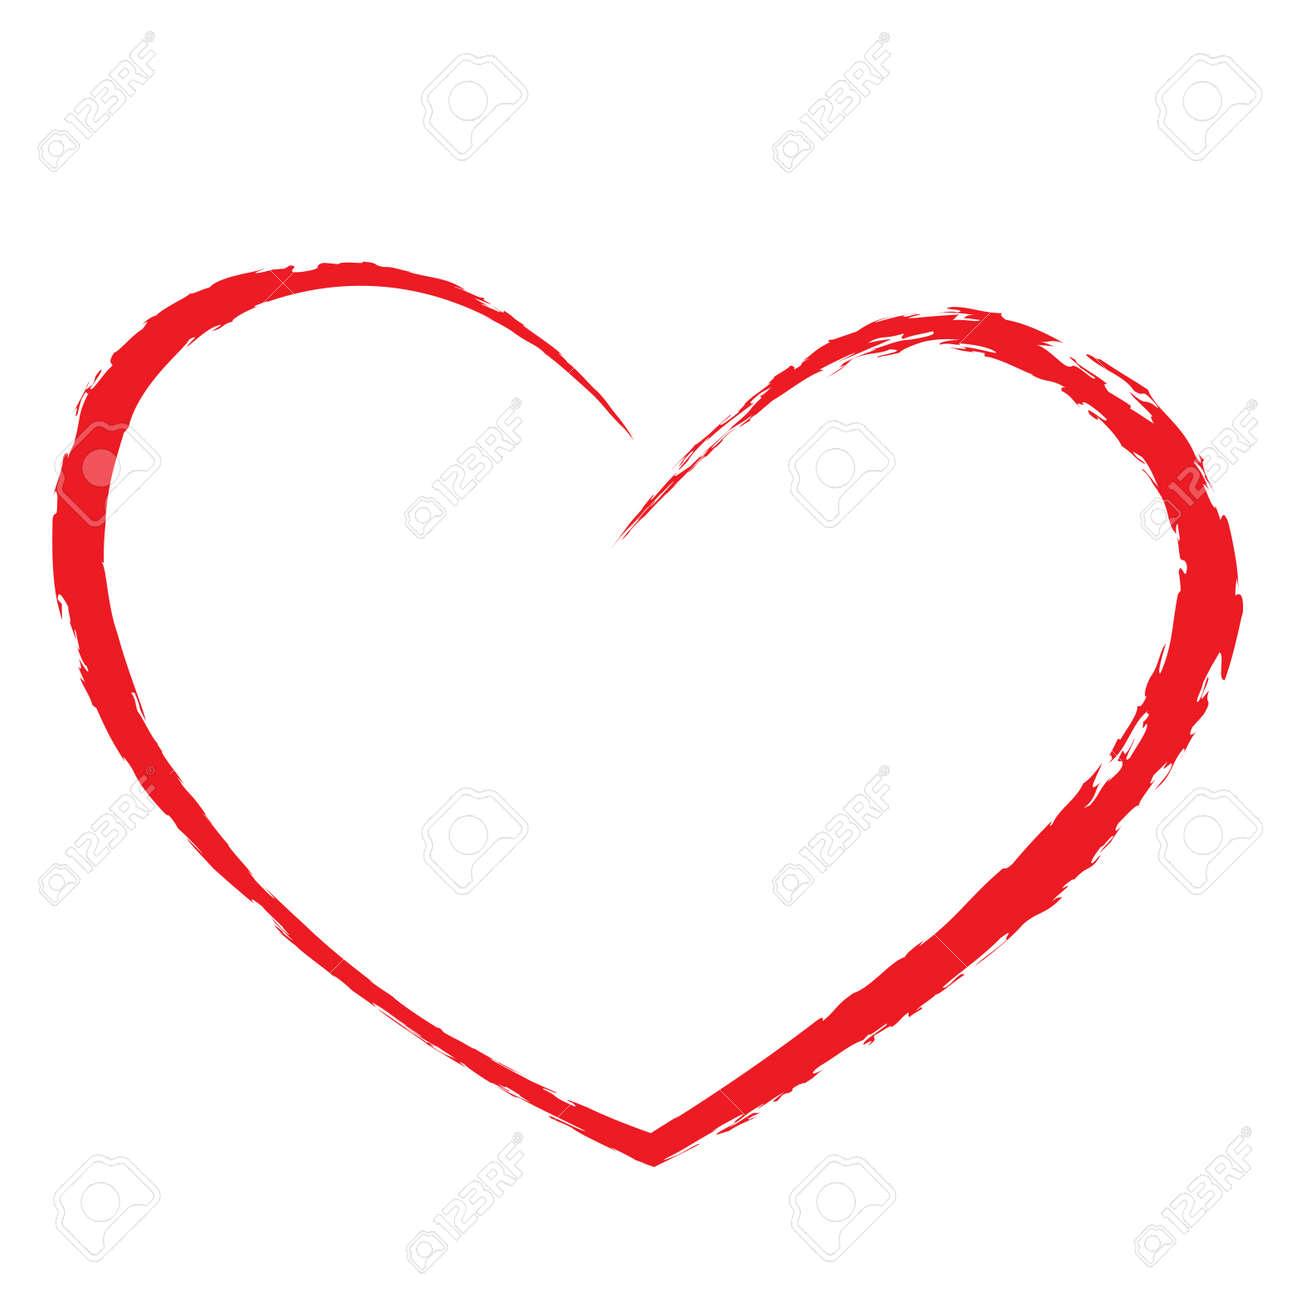 heart drawing Stock Vector - 20405216